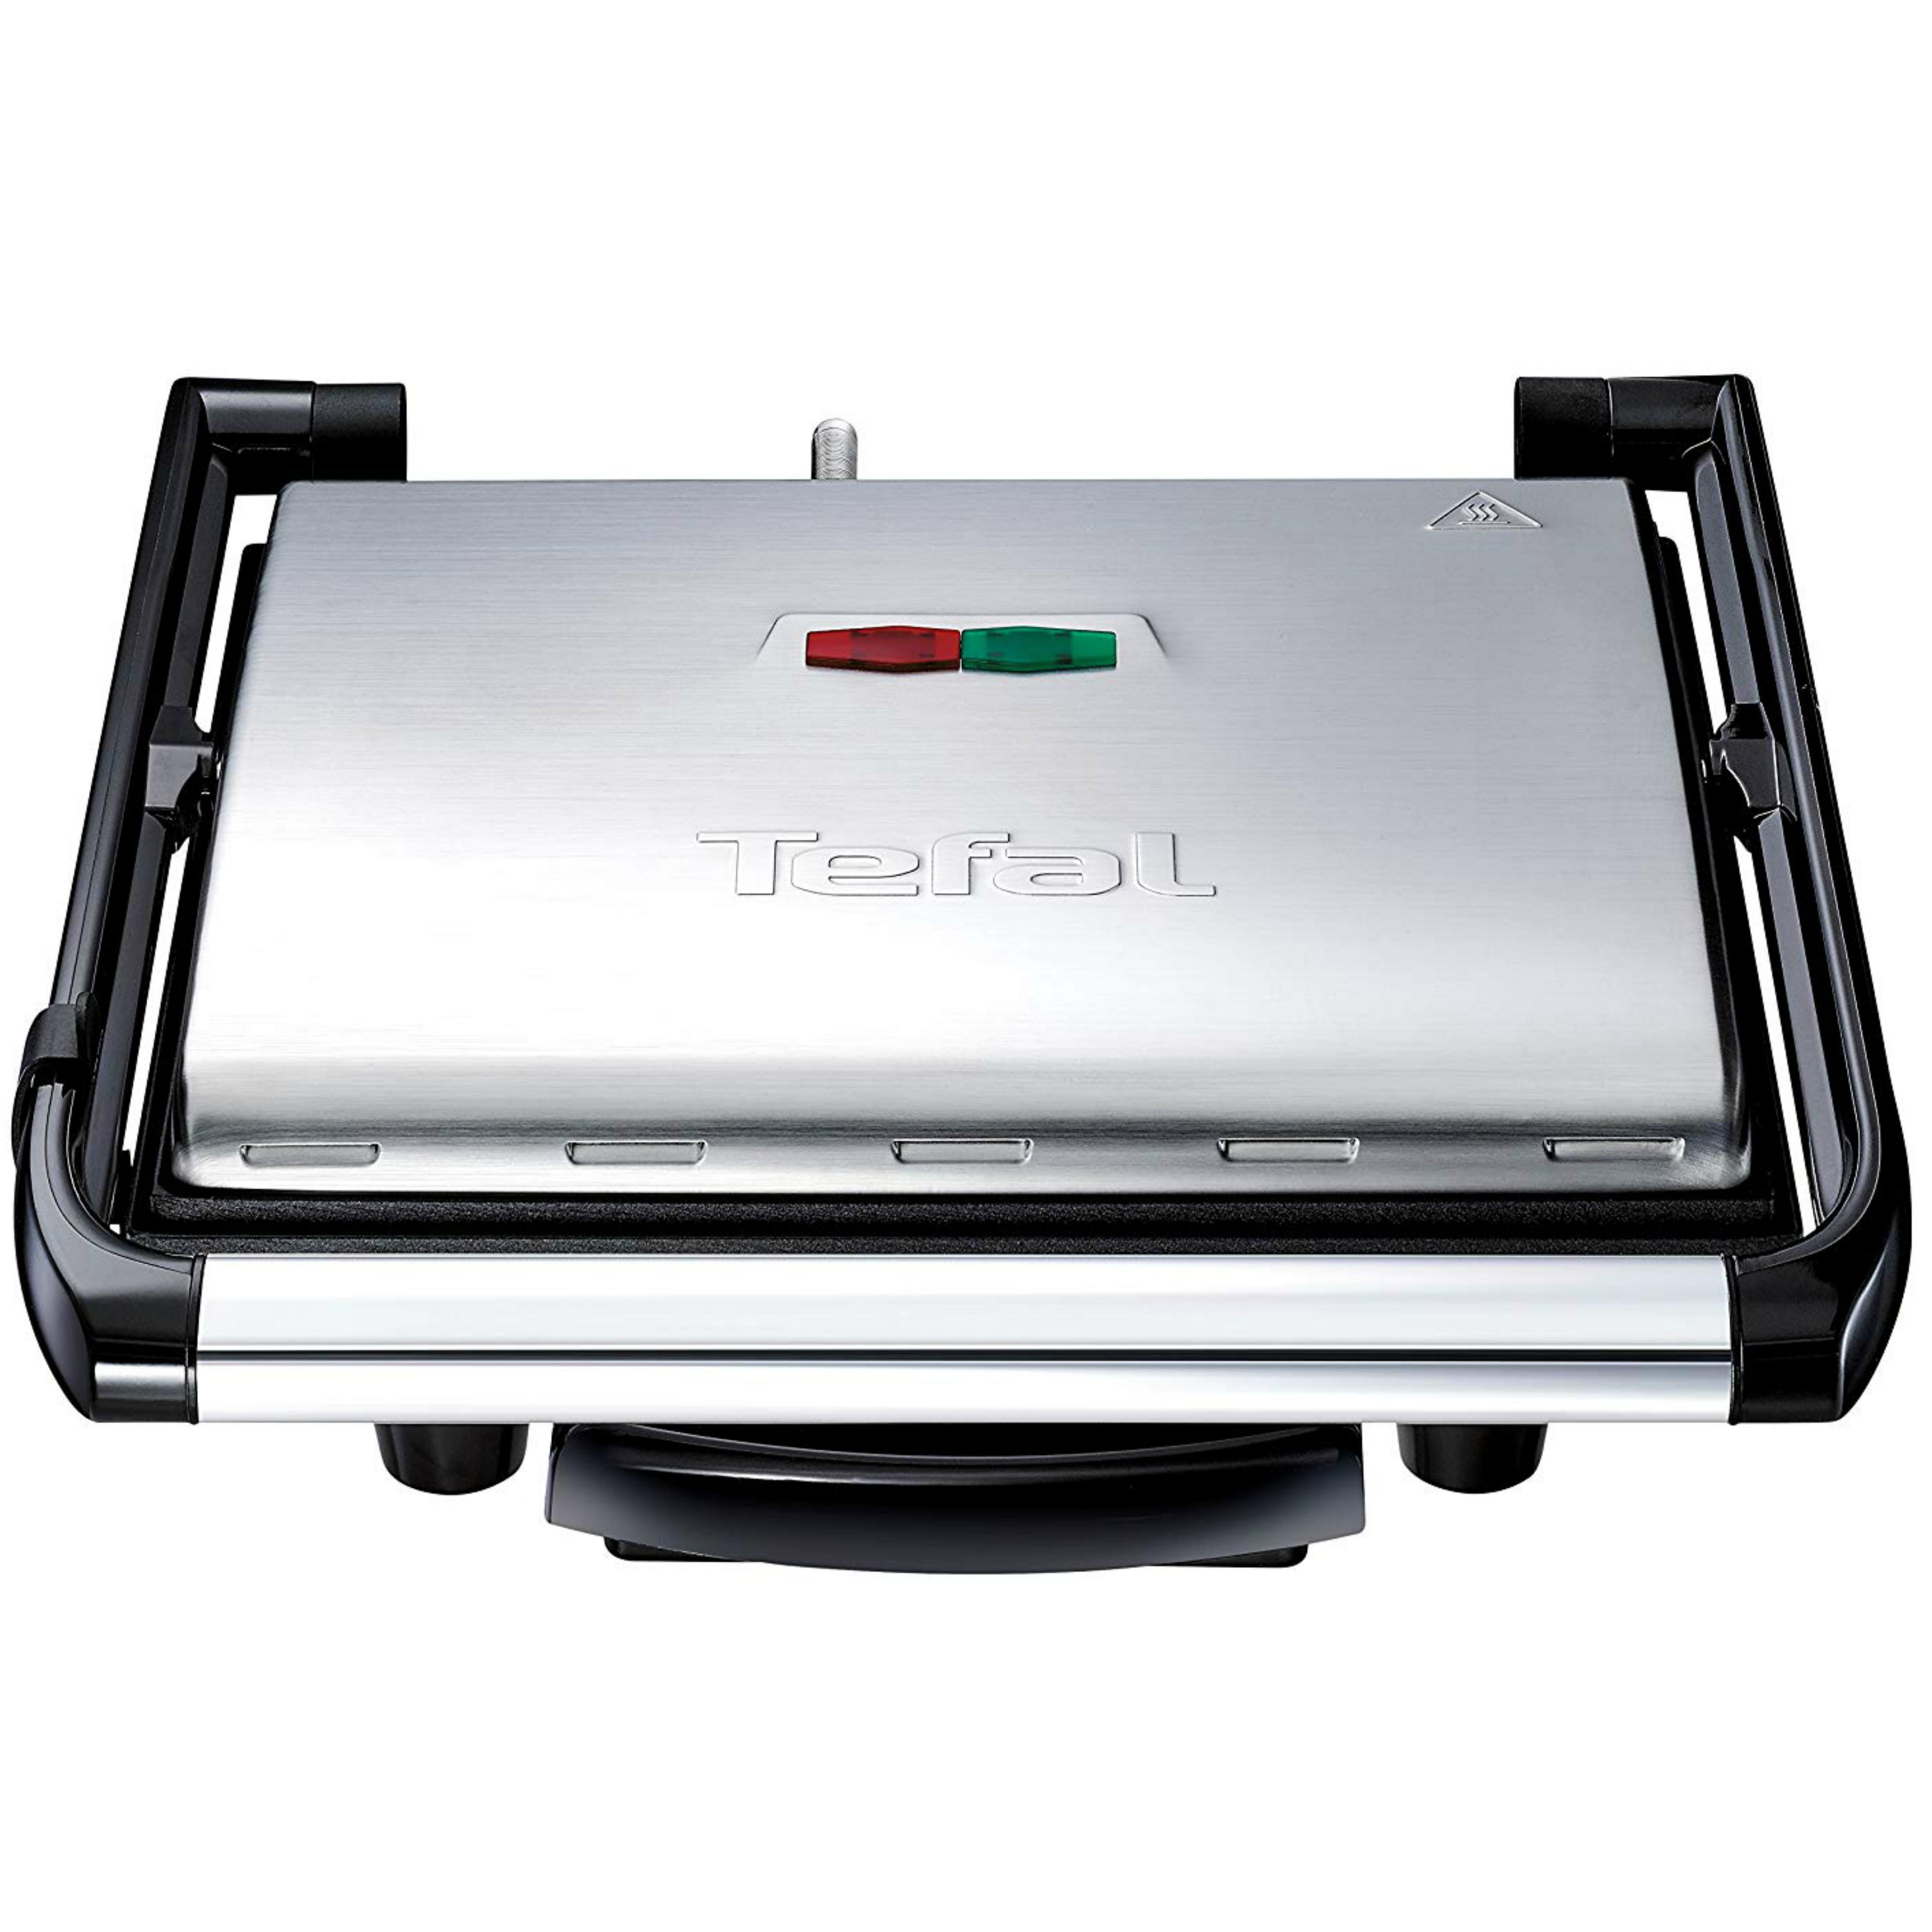 Tefal Inicio Multifunction Grill | 2000W | Easy Storage/Clean | Black-Silver | GC241D40